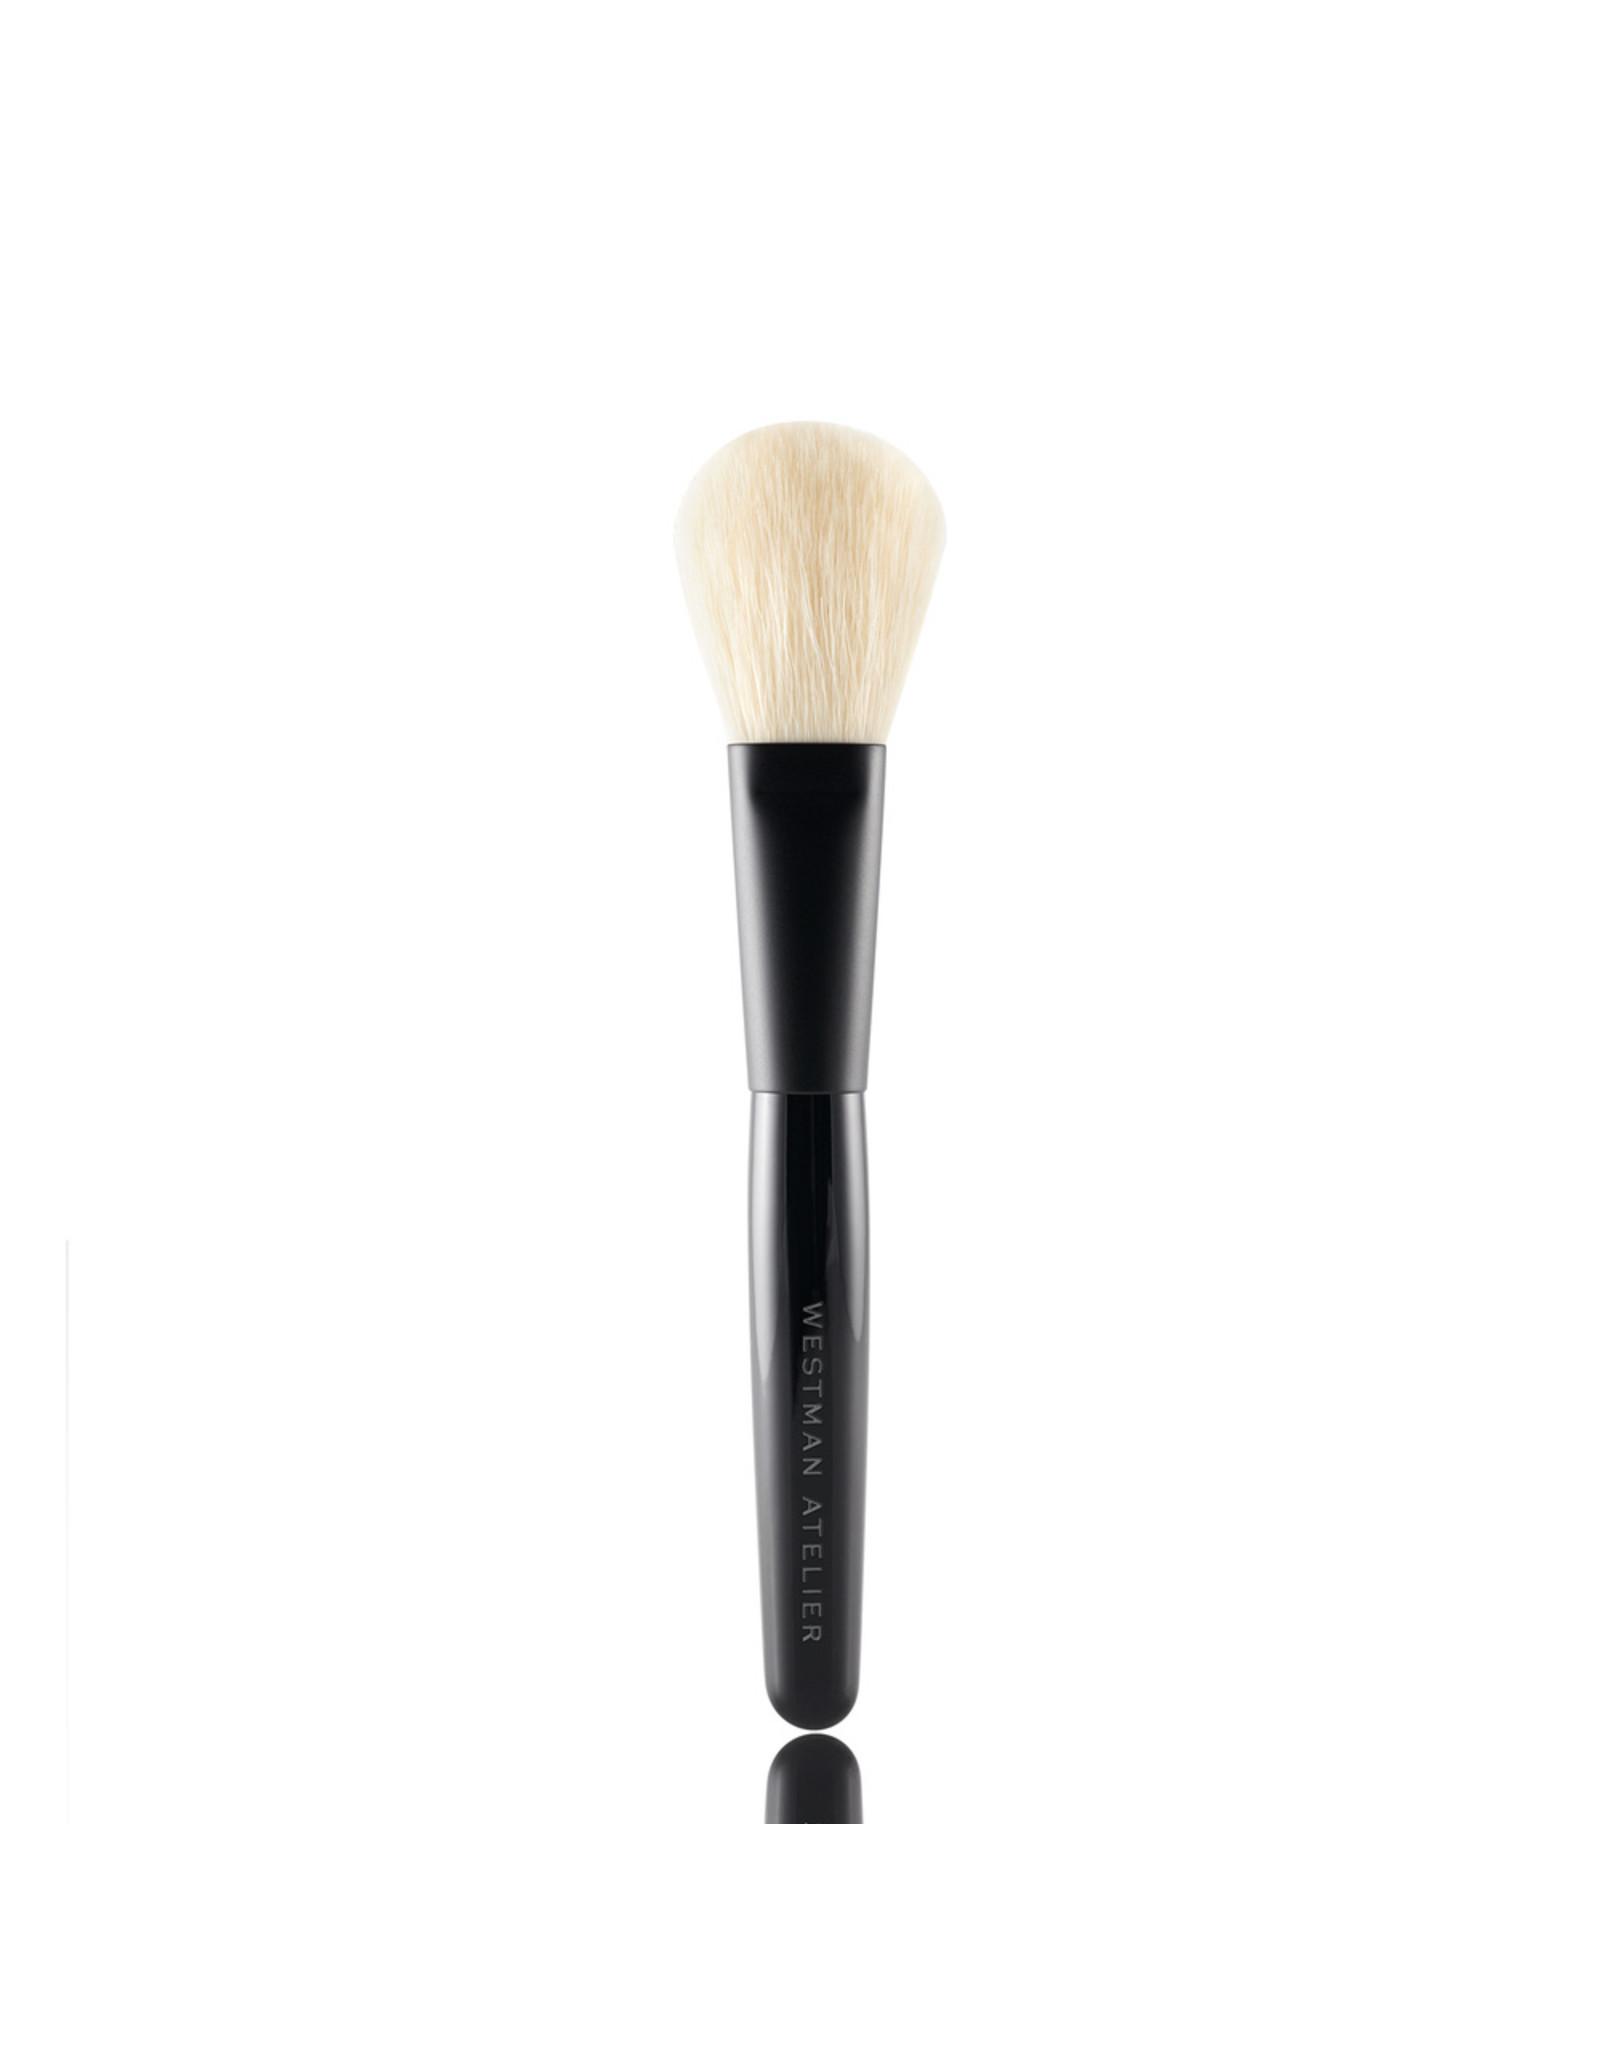 Westman Atelier Westman Atelier Powder Brush